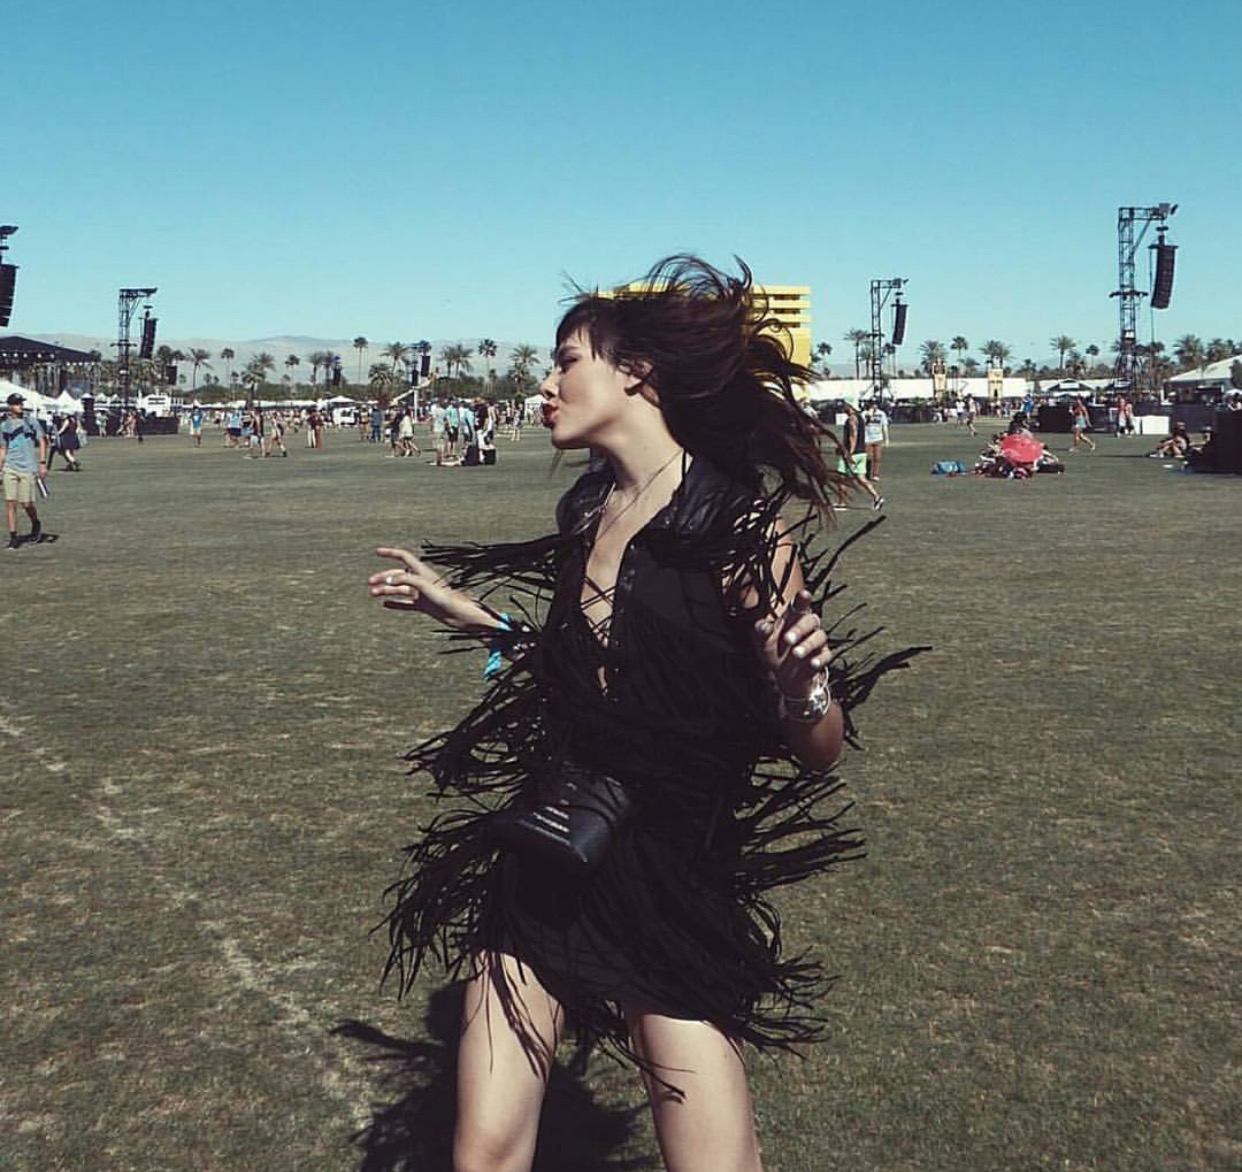 festival Haute Hippe Coachella Neiman Marcus Polaroid.